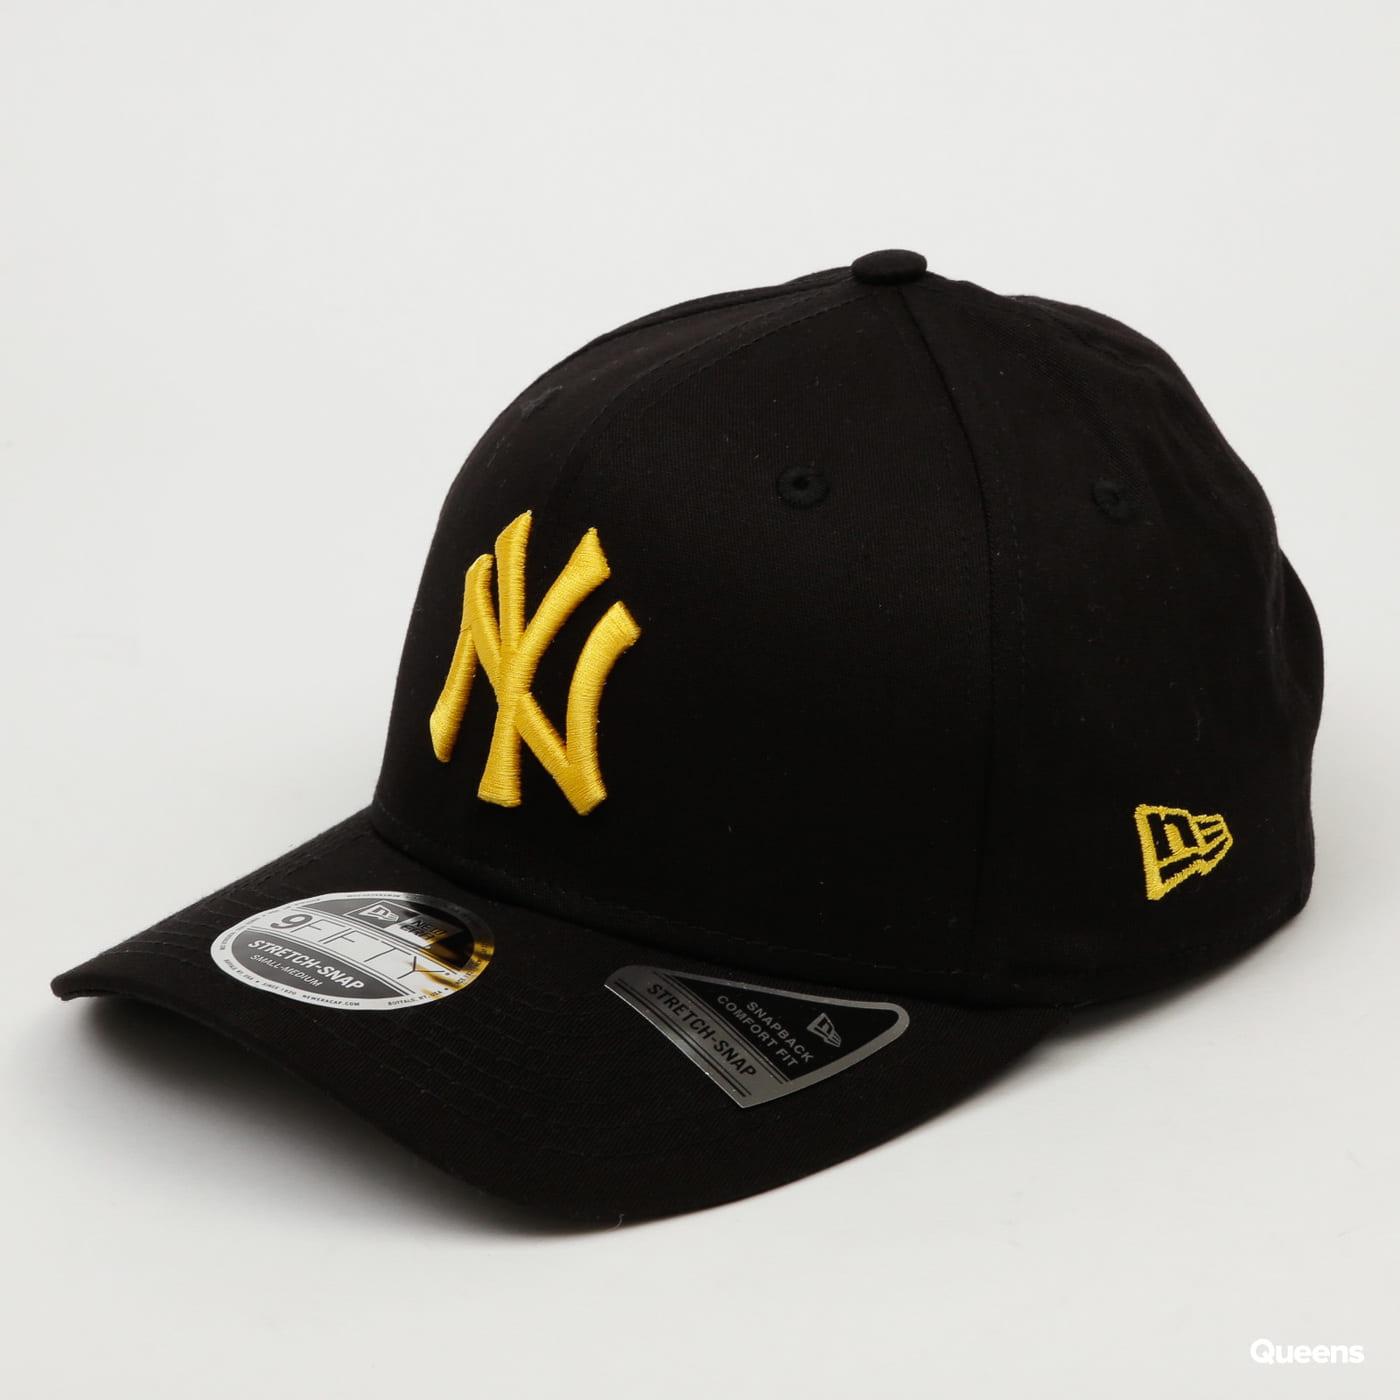 New Era 950 Stretch Snap League Essential NY black / yellow